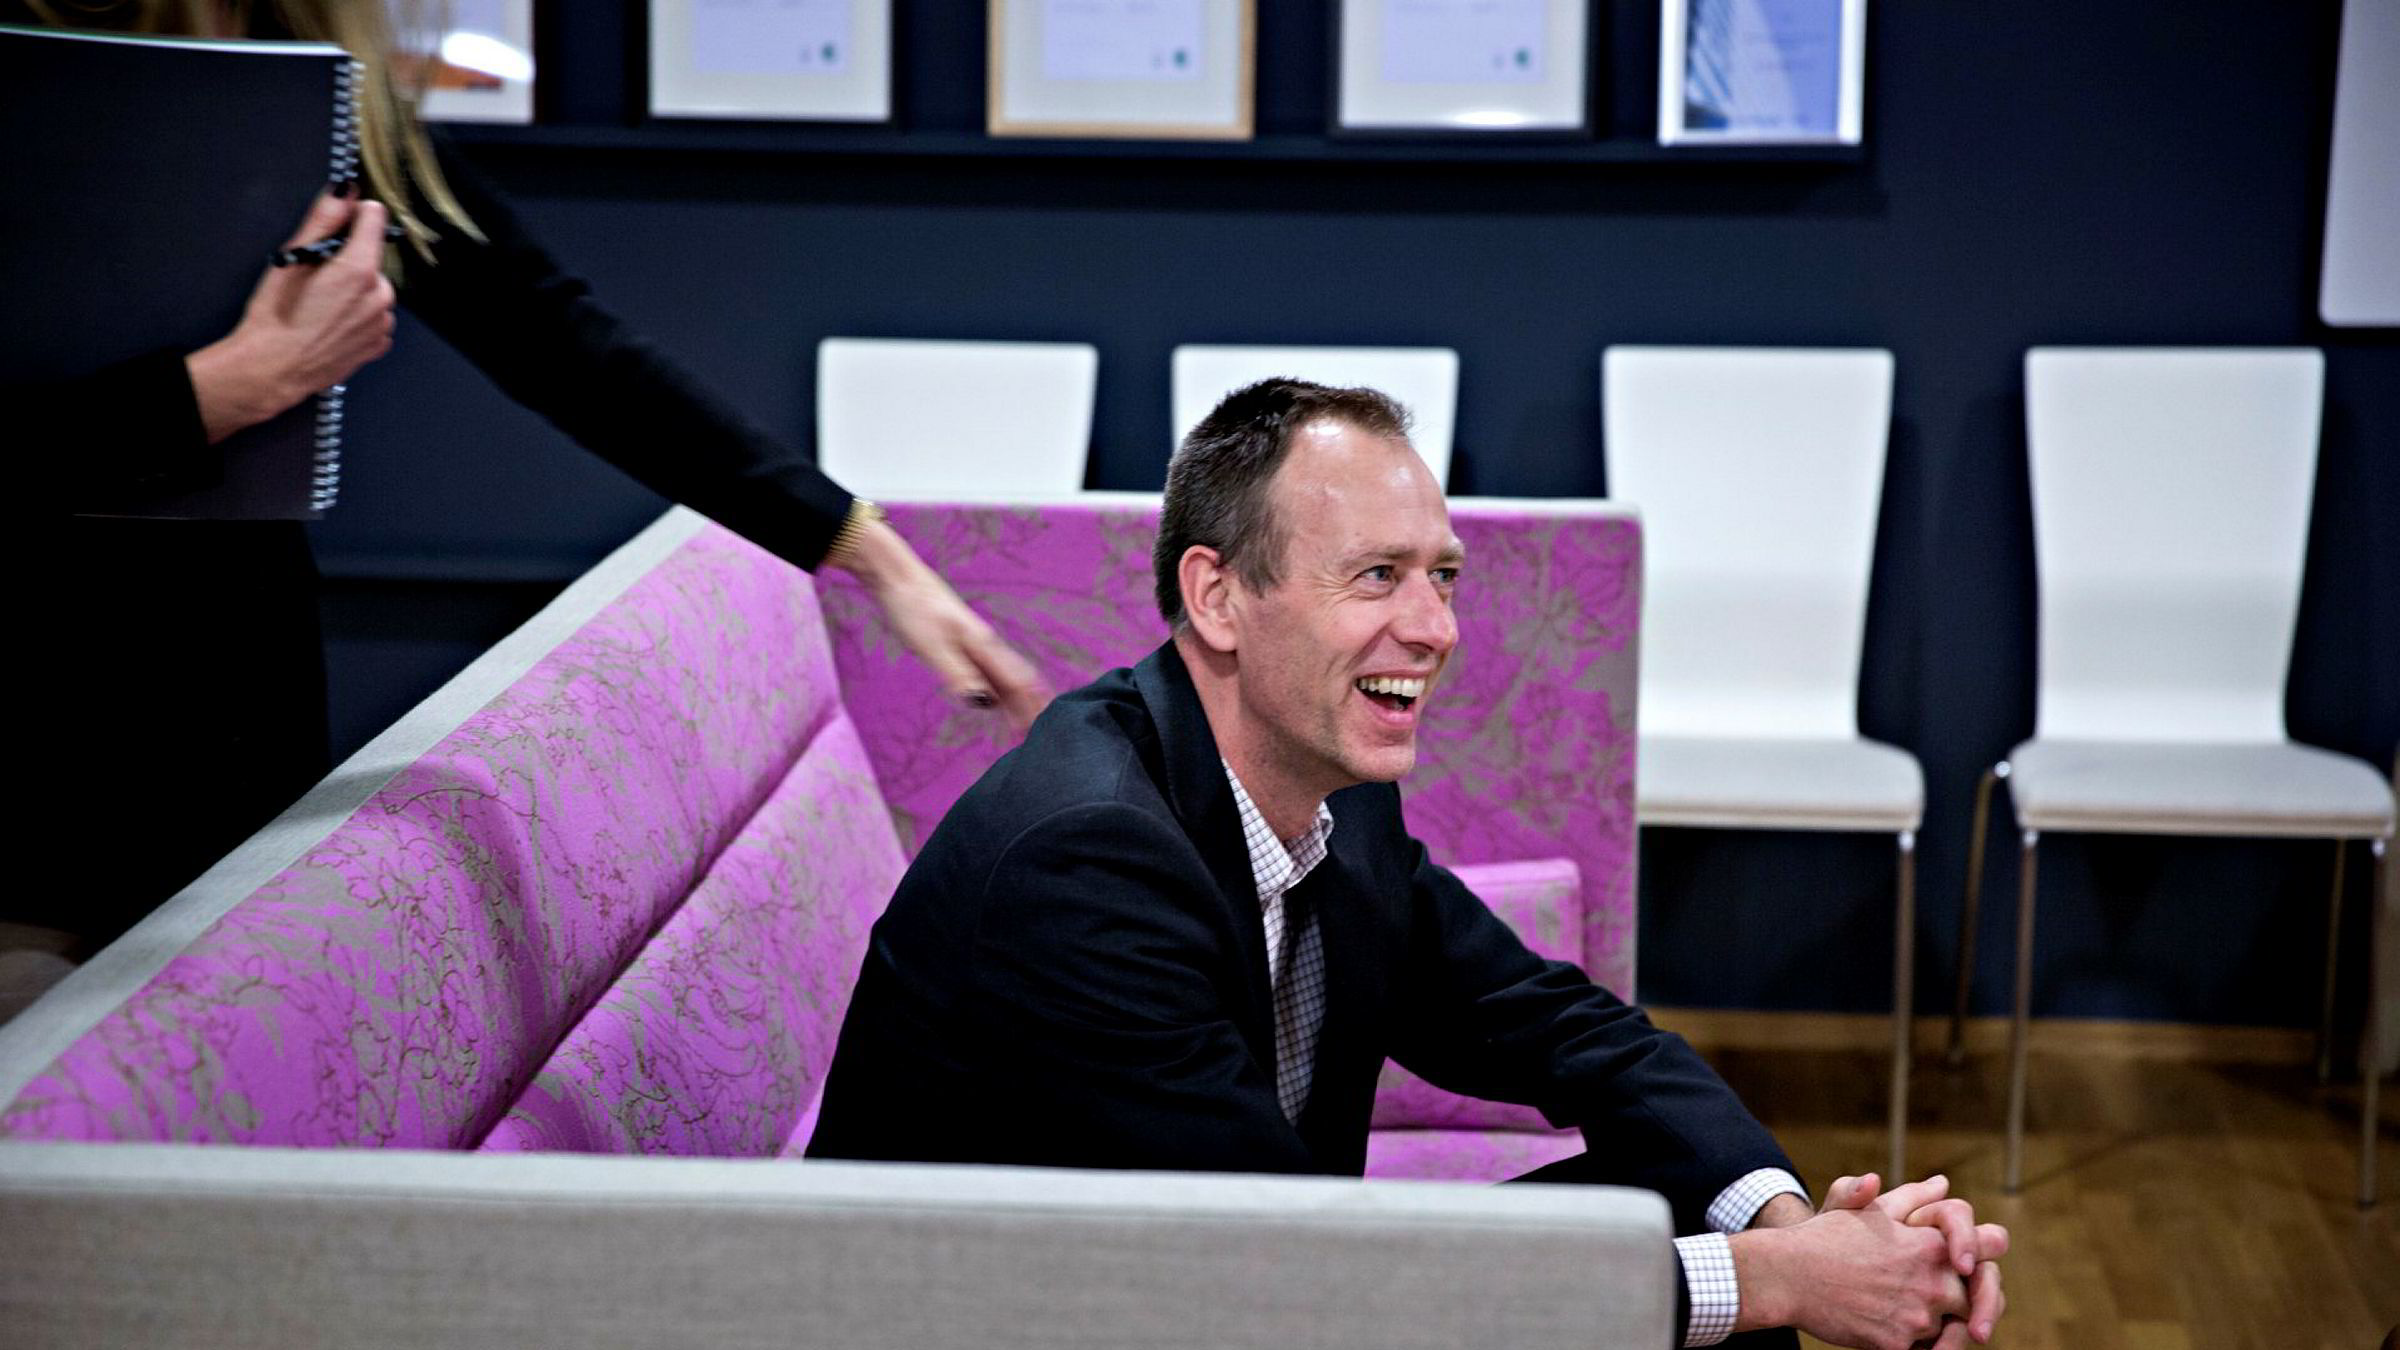 Finansdirektør Bjørn Tjaum i Steen & Strøm har landet en rimelig grei låneavtale. Foto: